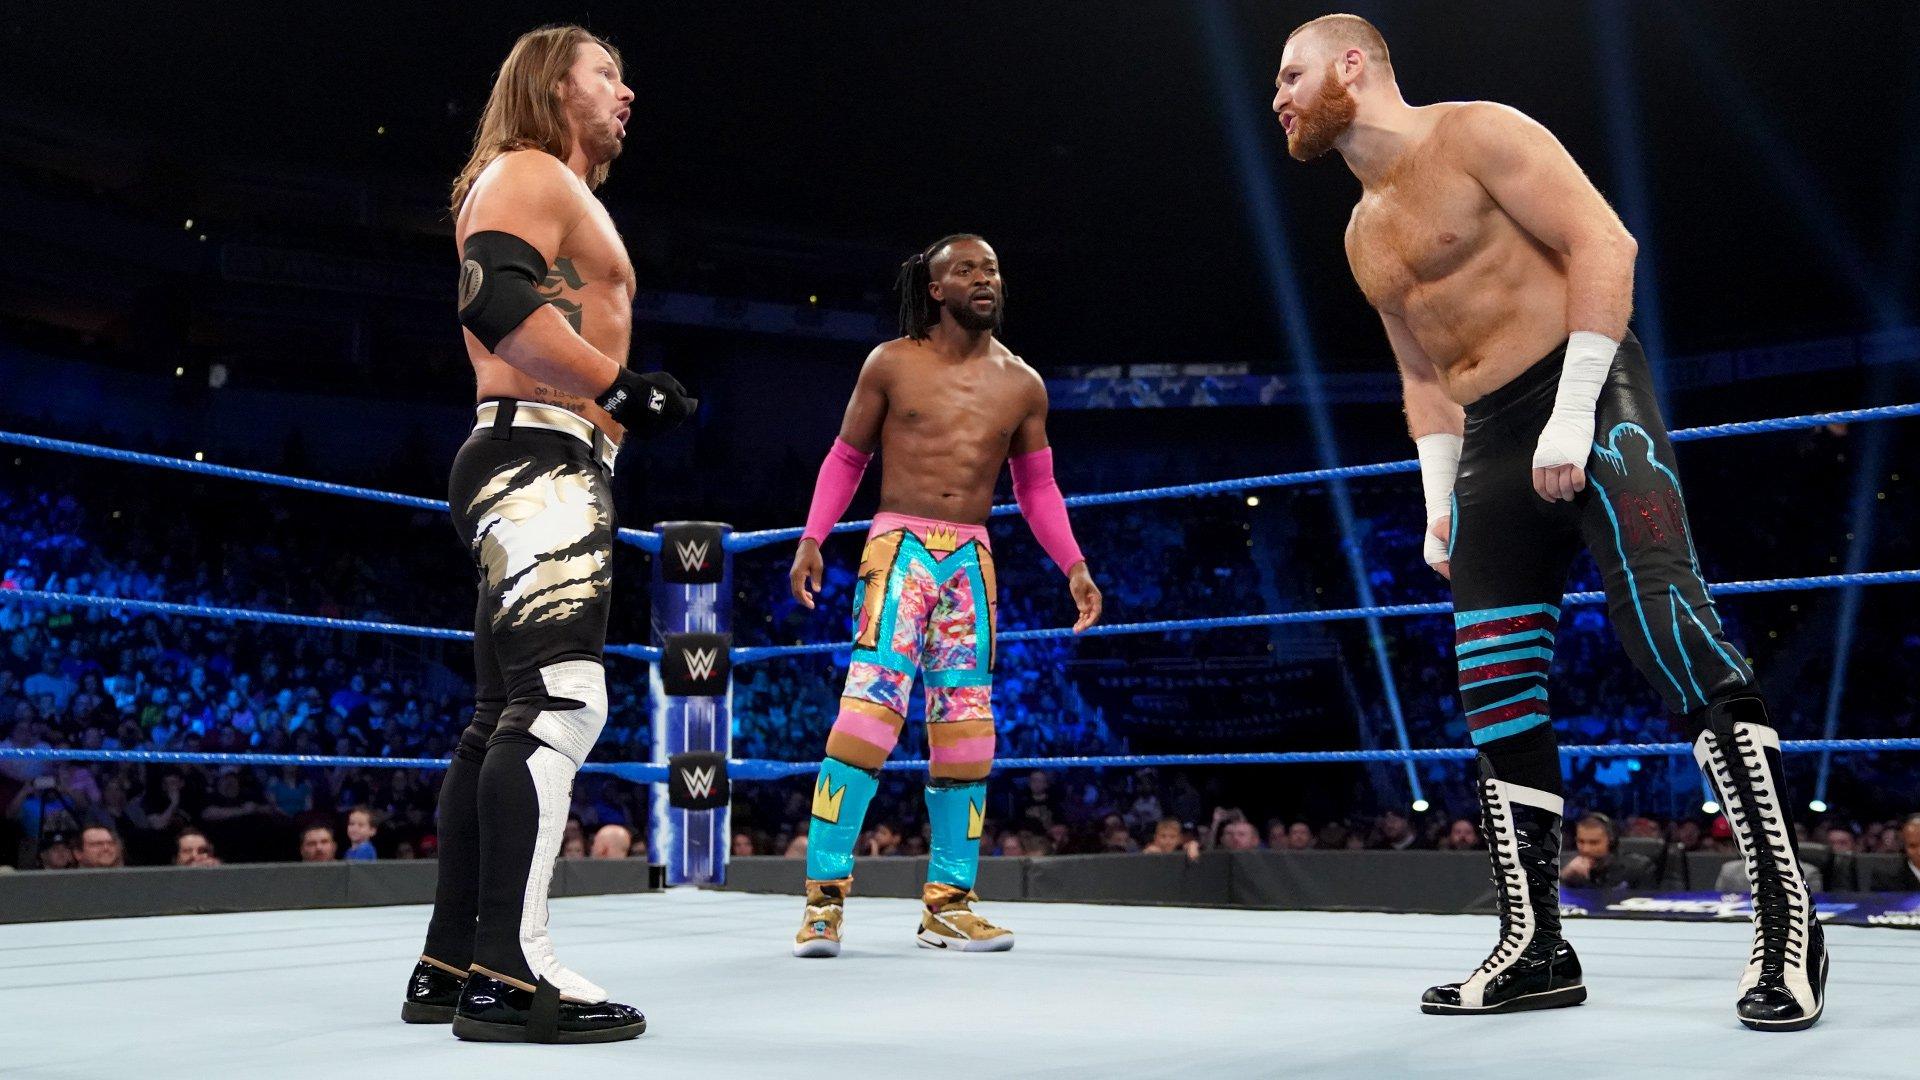 Kofi Kingston vs. AJ Styles vs. Sami Zayn – Match Triple Menace pour le Championnat WWE: SmackDown LIVE, 7 Mai 2019